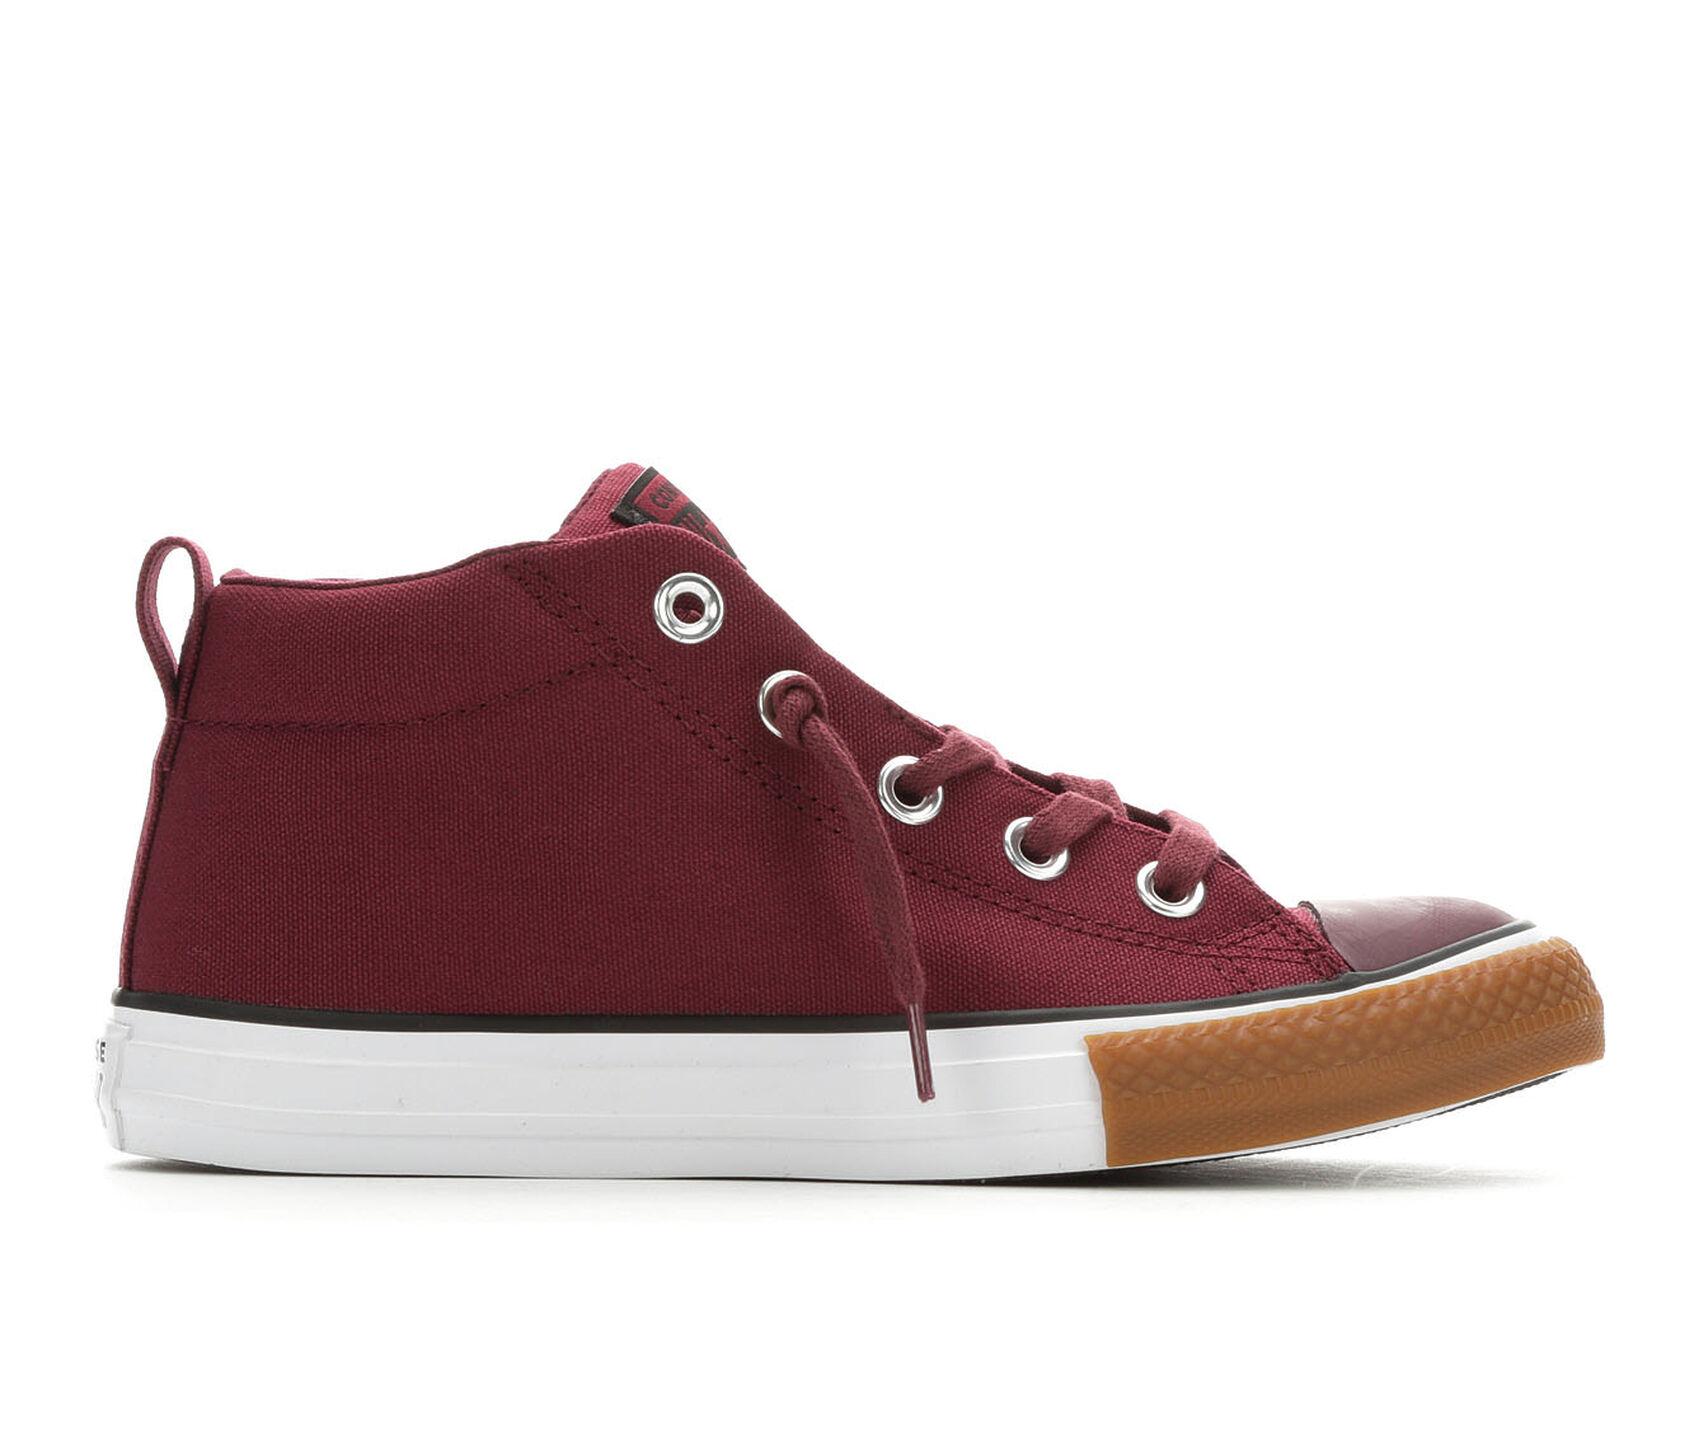 Boys  Converse Little Kid   Big Kid CTAS Street Mid Gum Sneakers ... 9614920fc